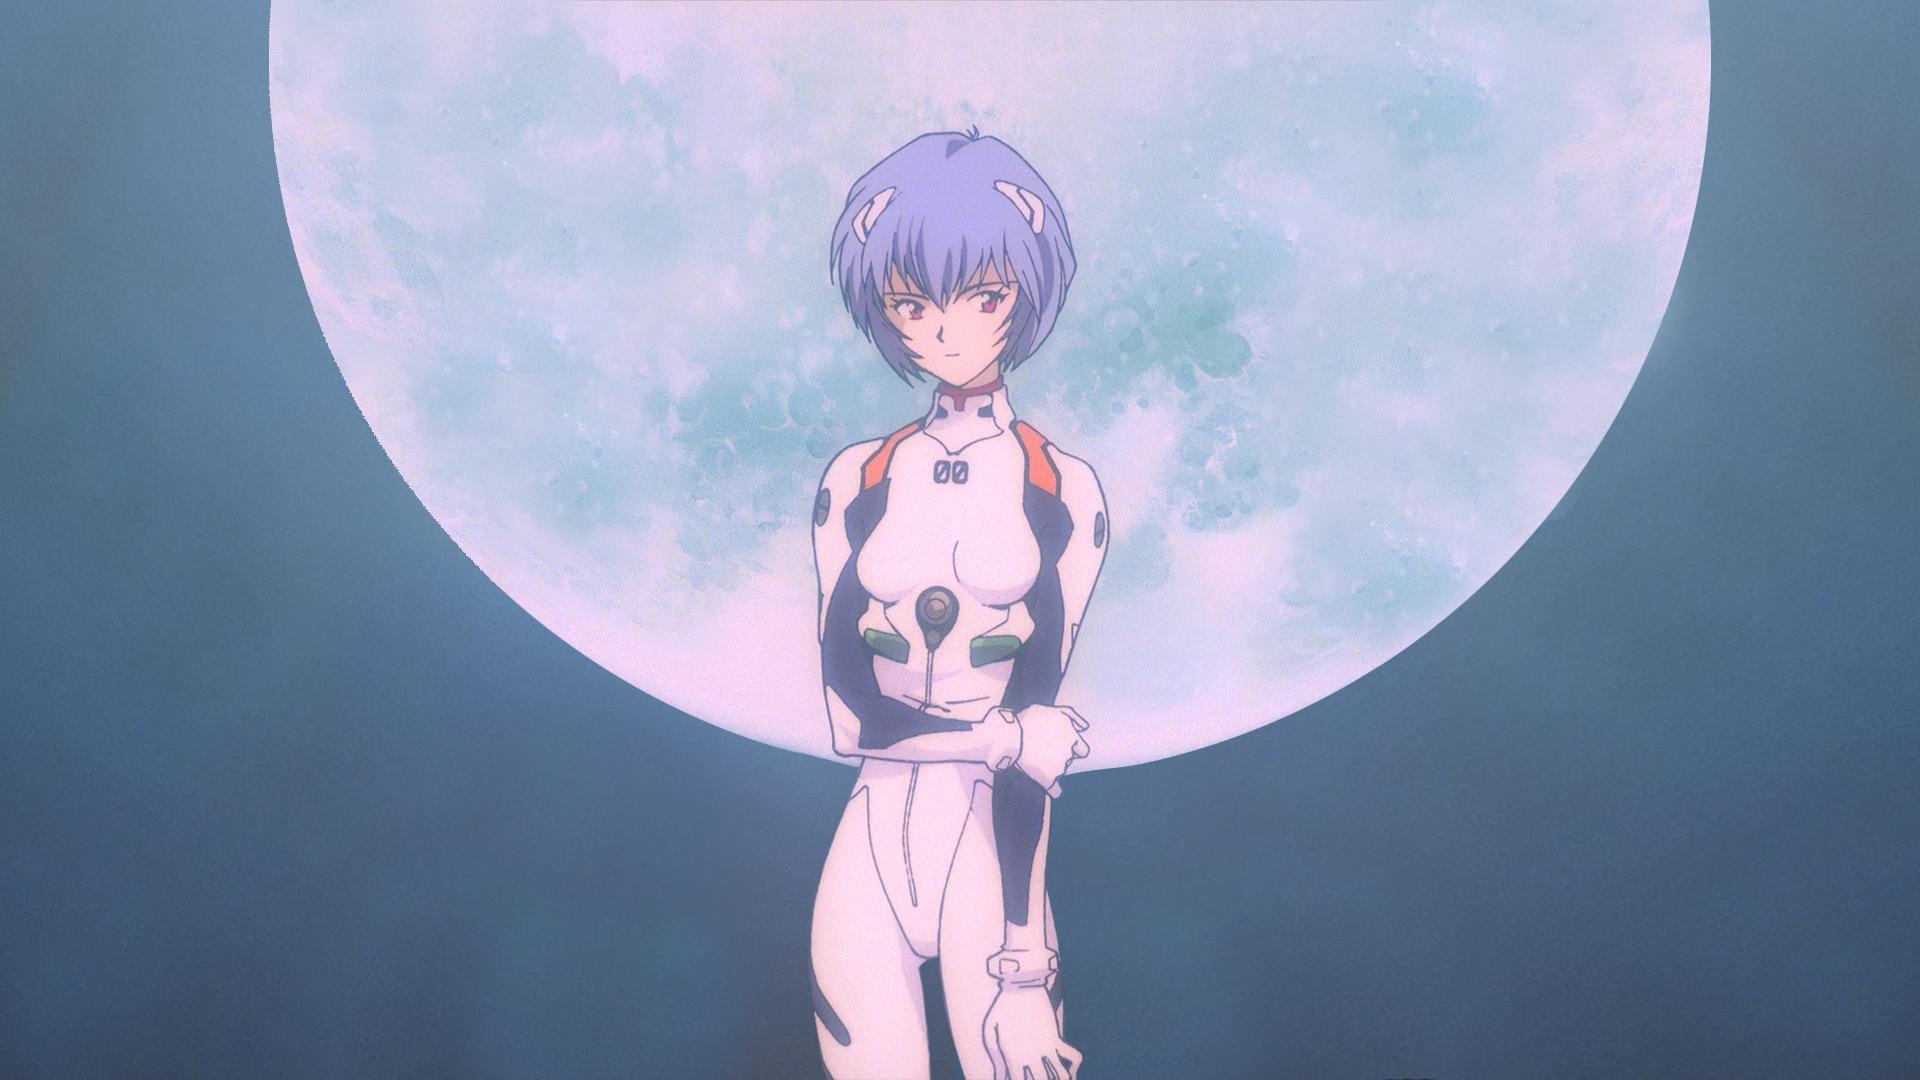 Anime 1920x1080 Ayanami Rei Neon Genesis Evangelion anime girls